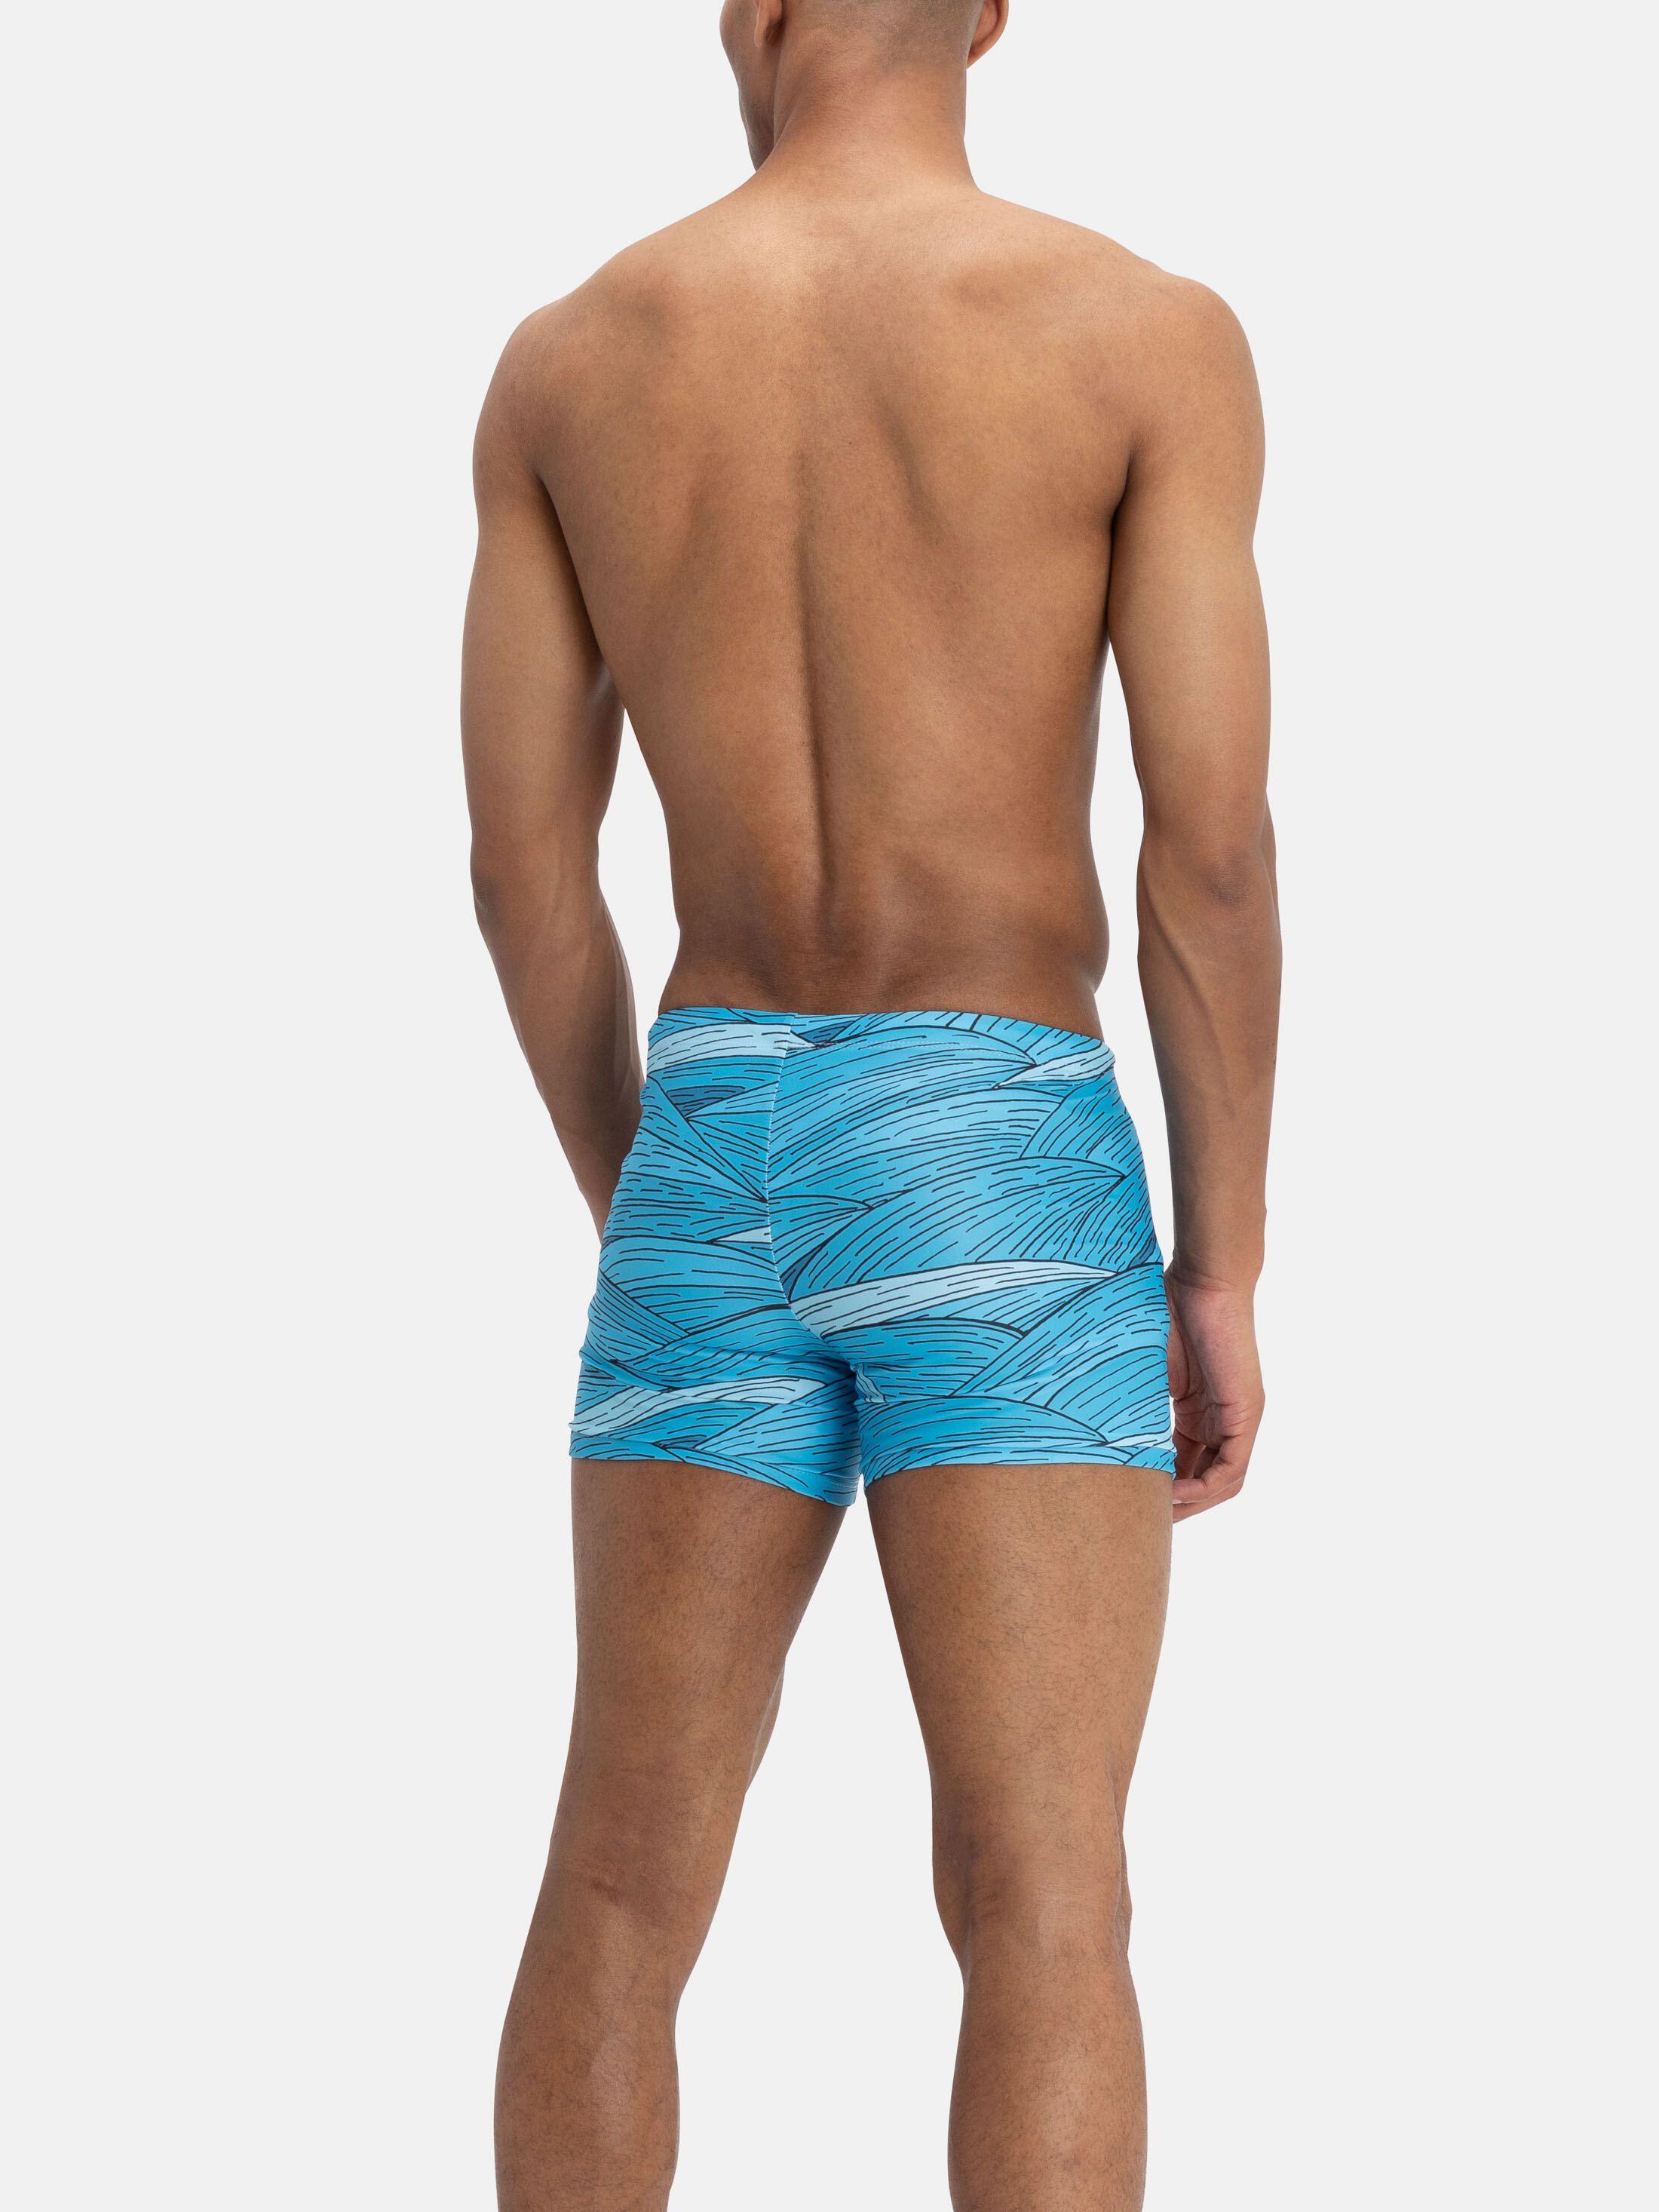 personalised swimming trunks